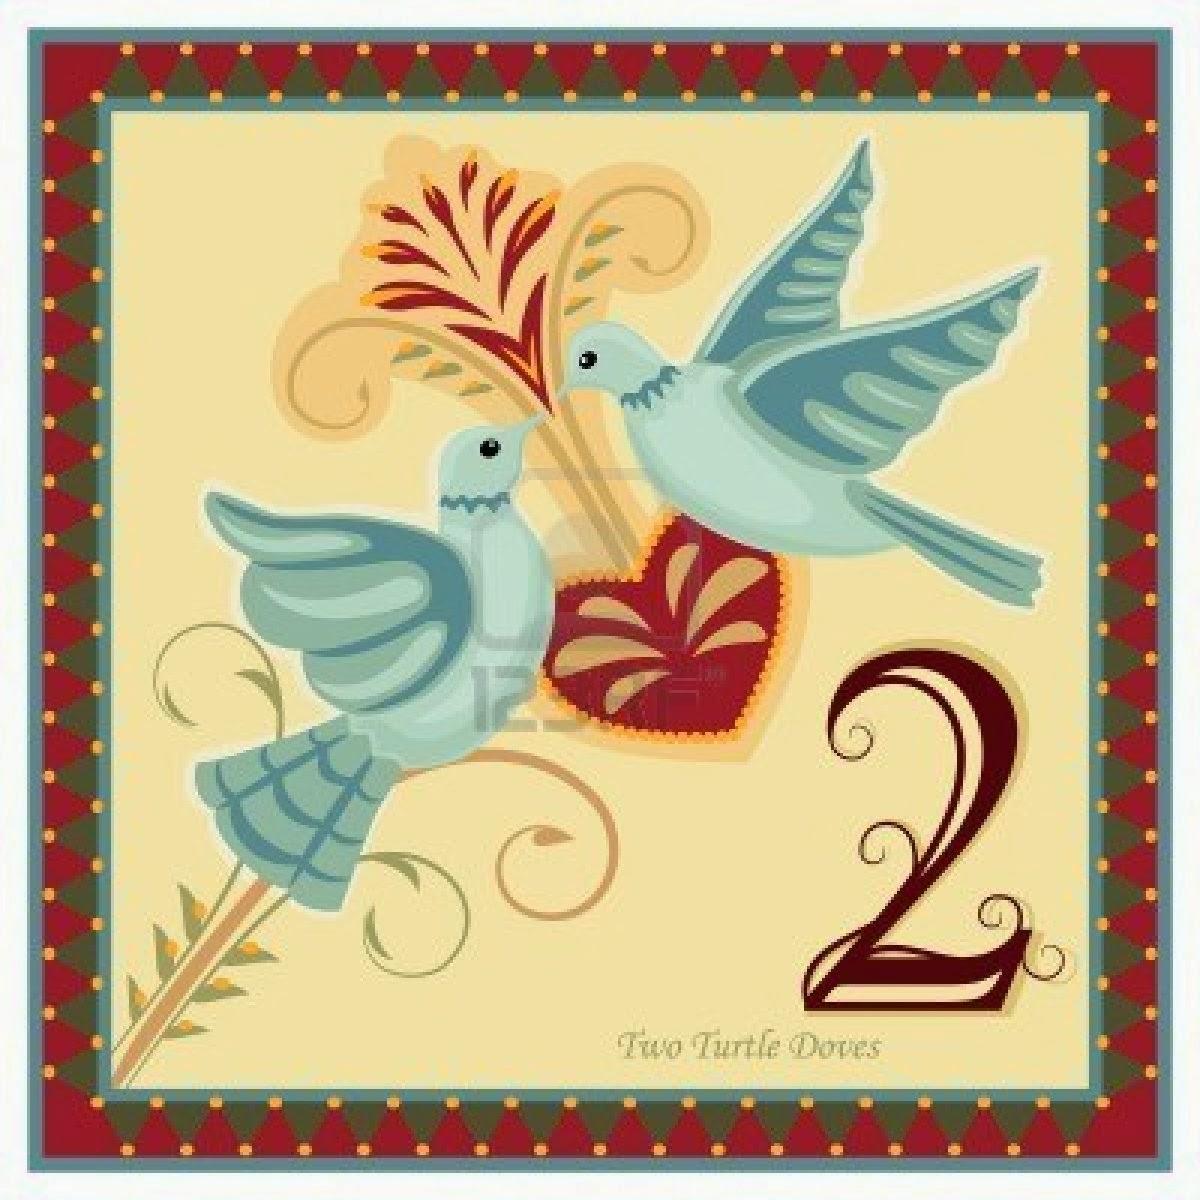 All Things Debra Dawn 12 Days Of Christmas Day 2